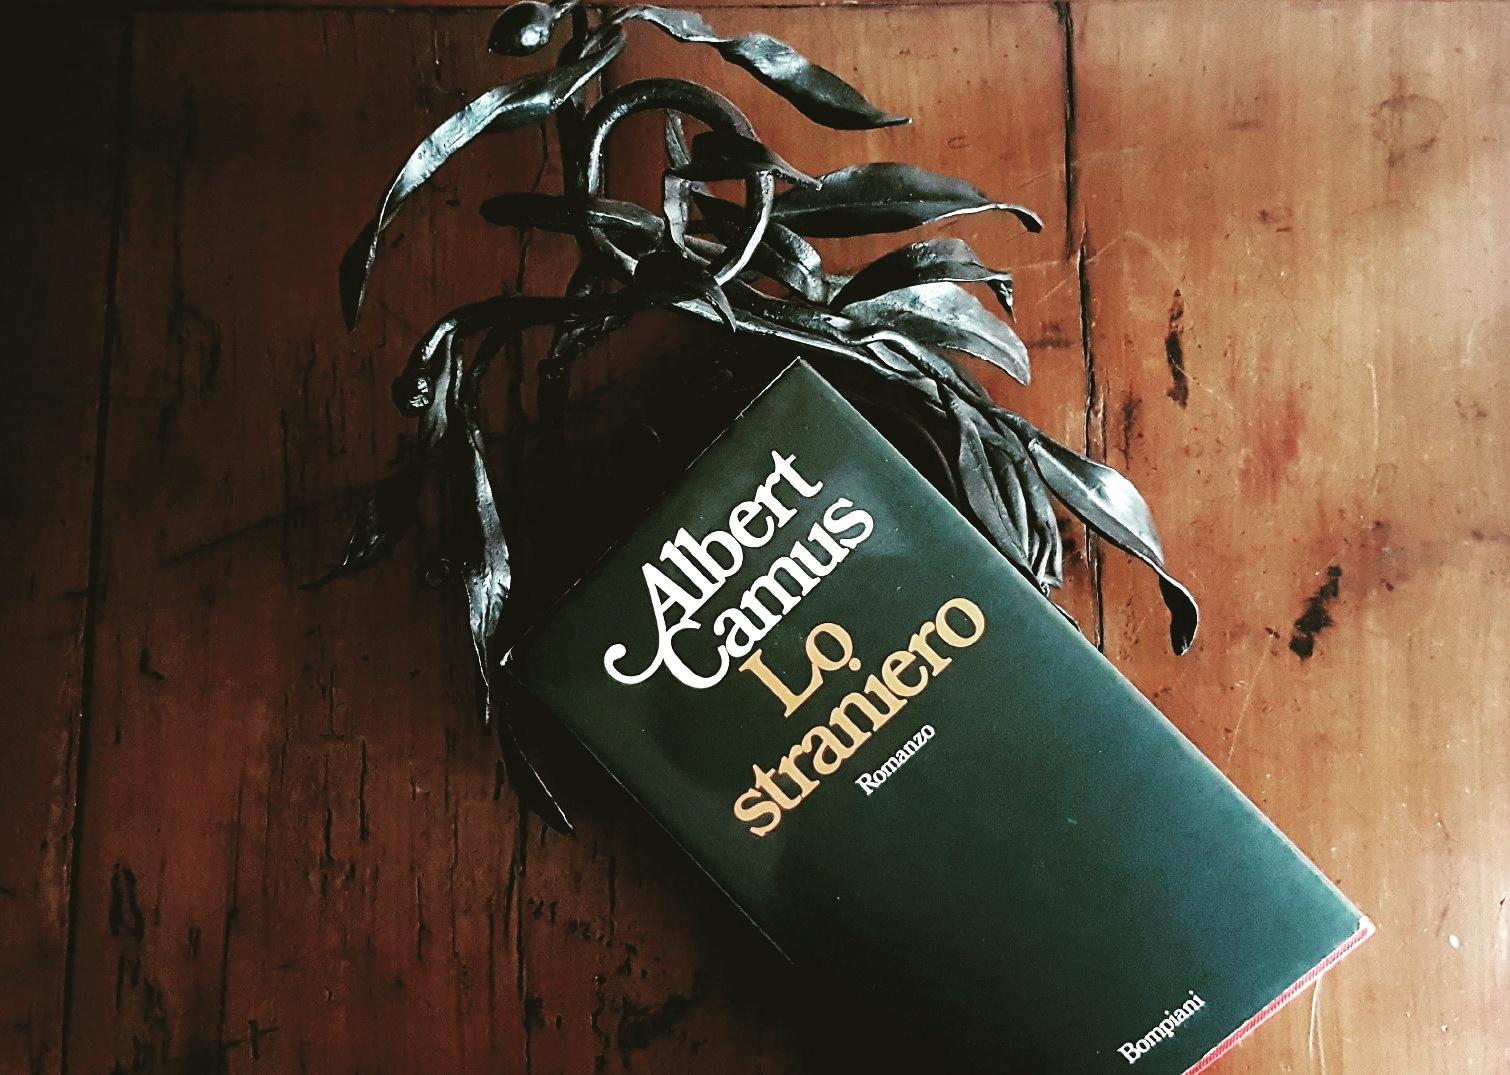 Albert-Camus-lo-straniero-451F